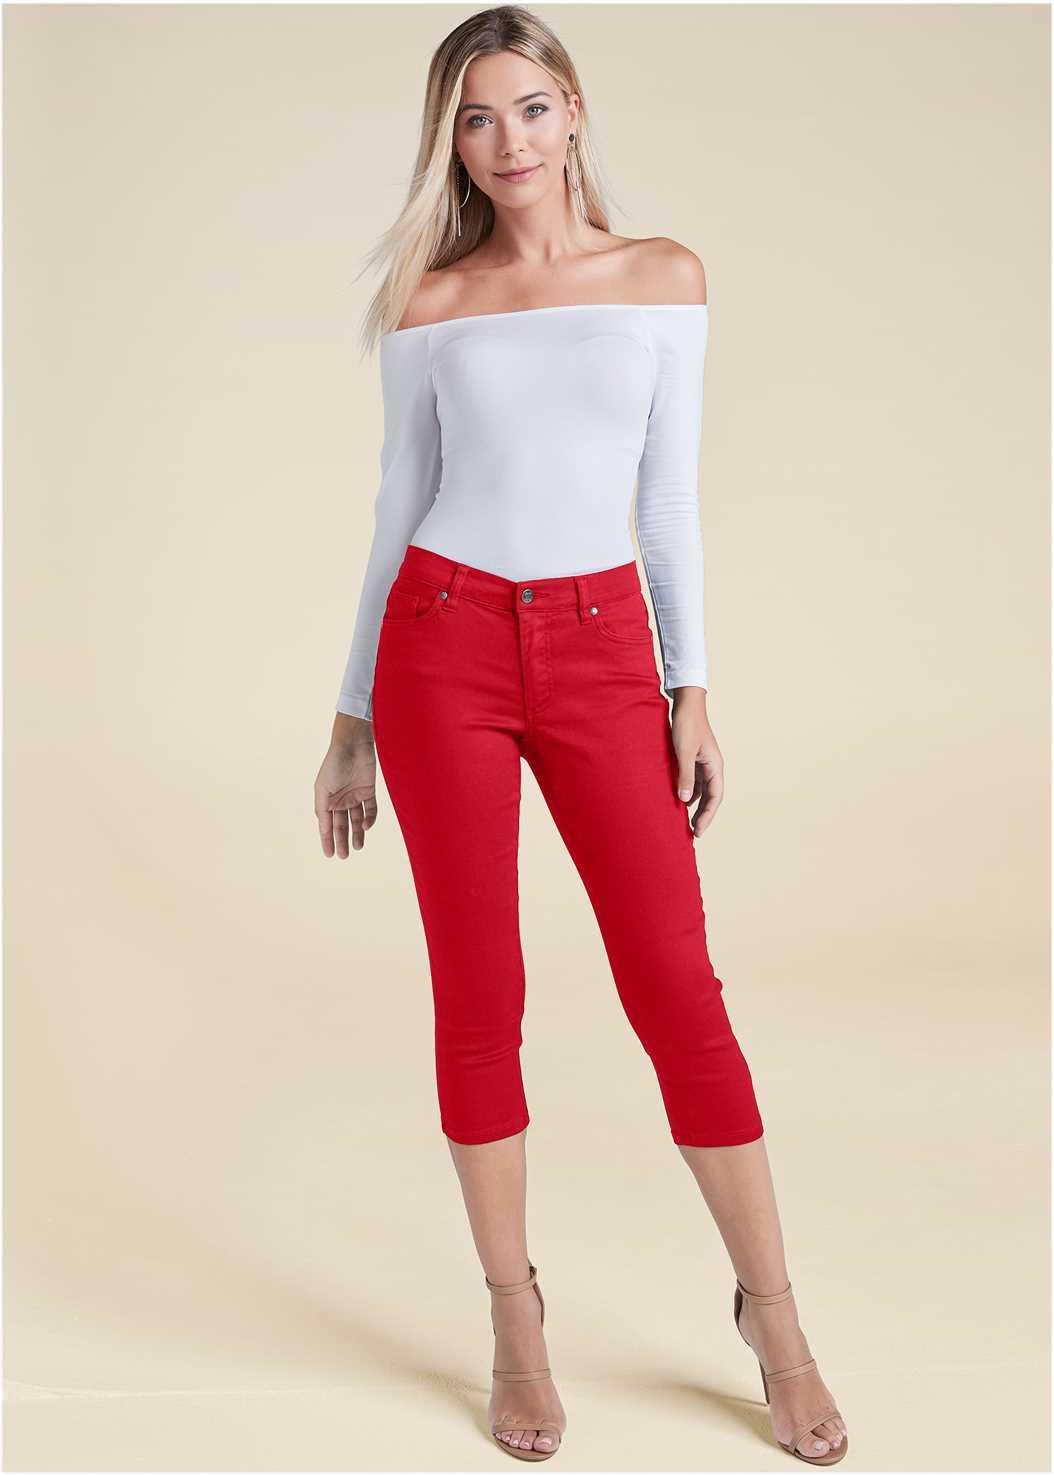 Color Capri Jeans,Off The Shoulder Top,Back Detail Top,Statement Earrings